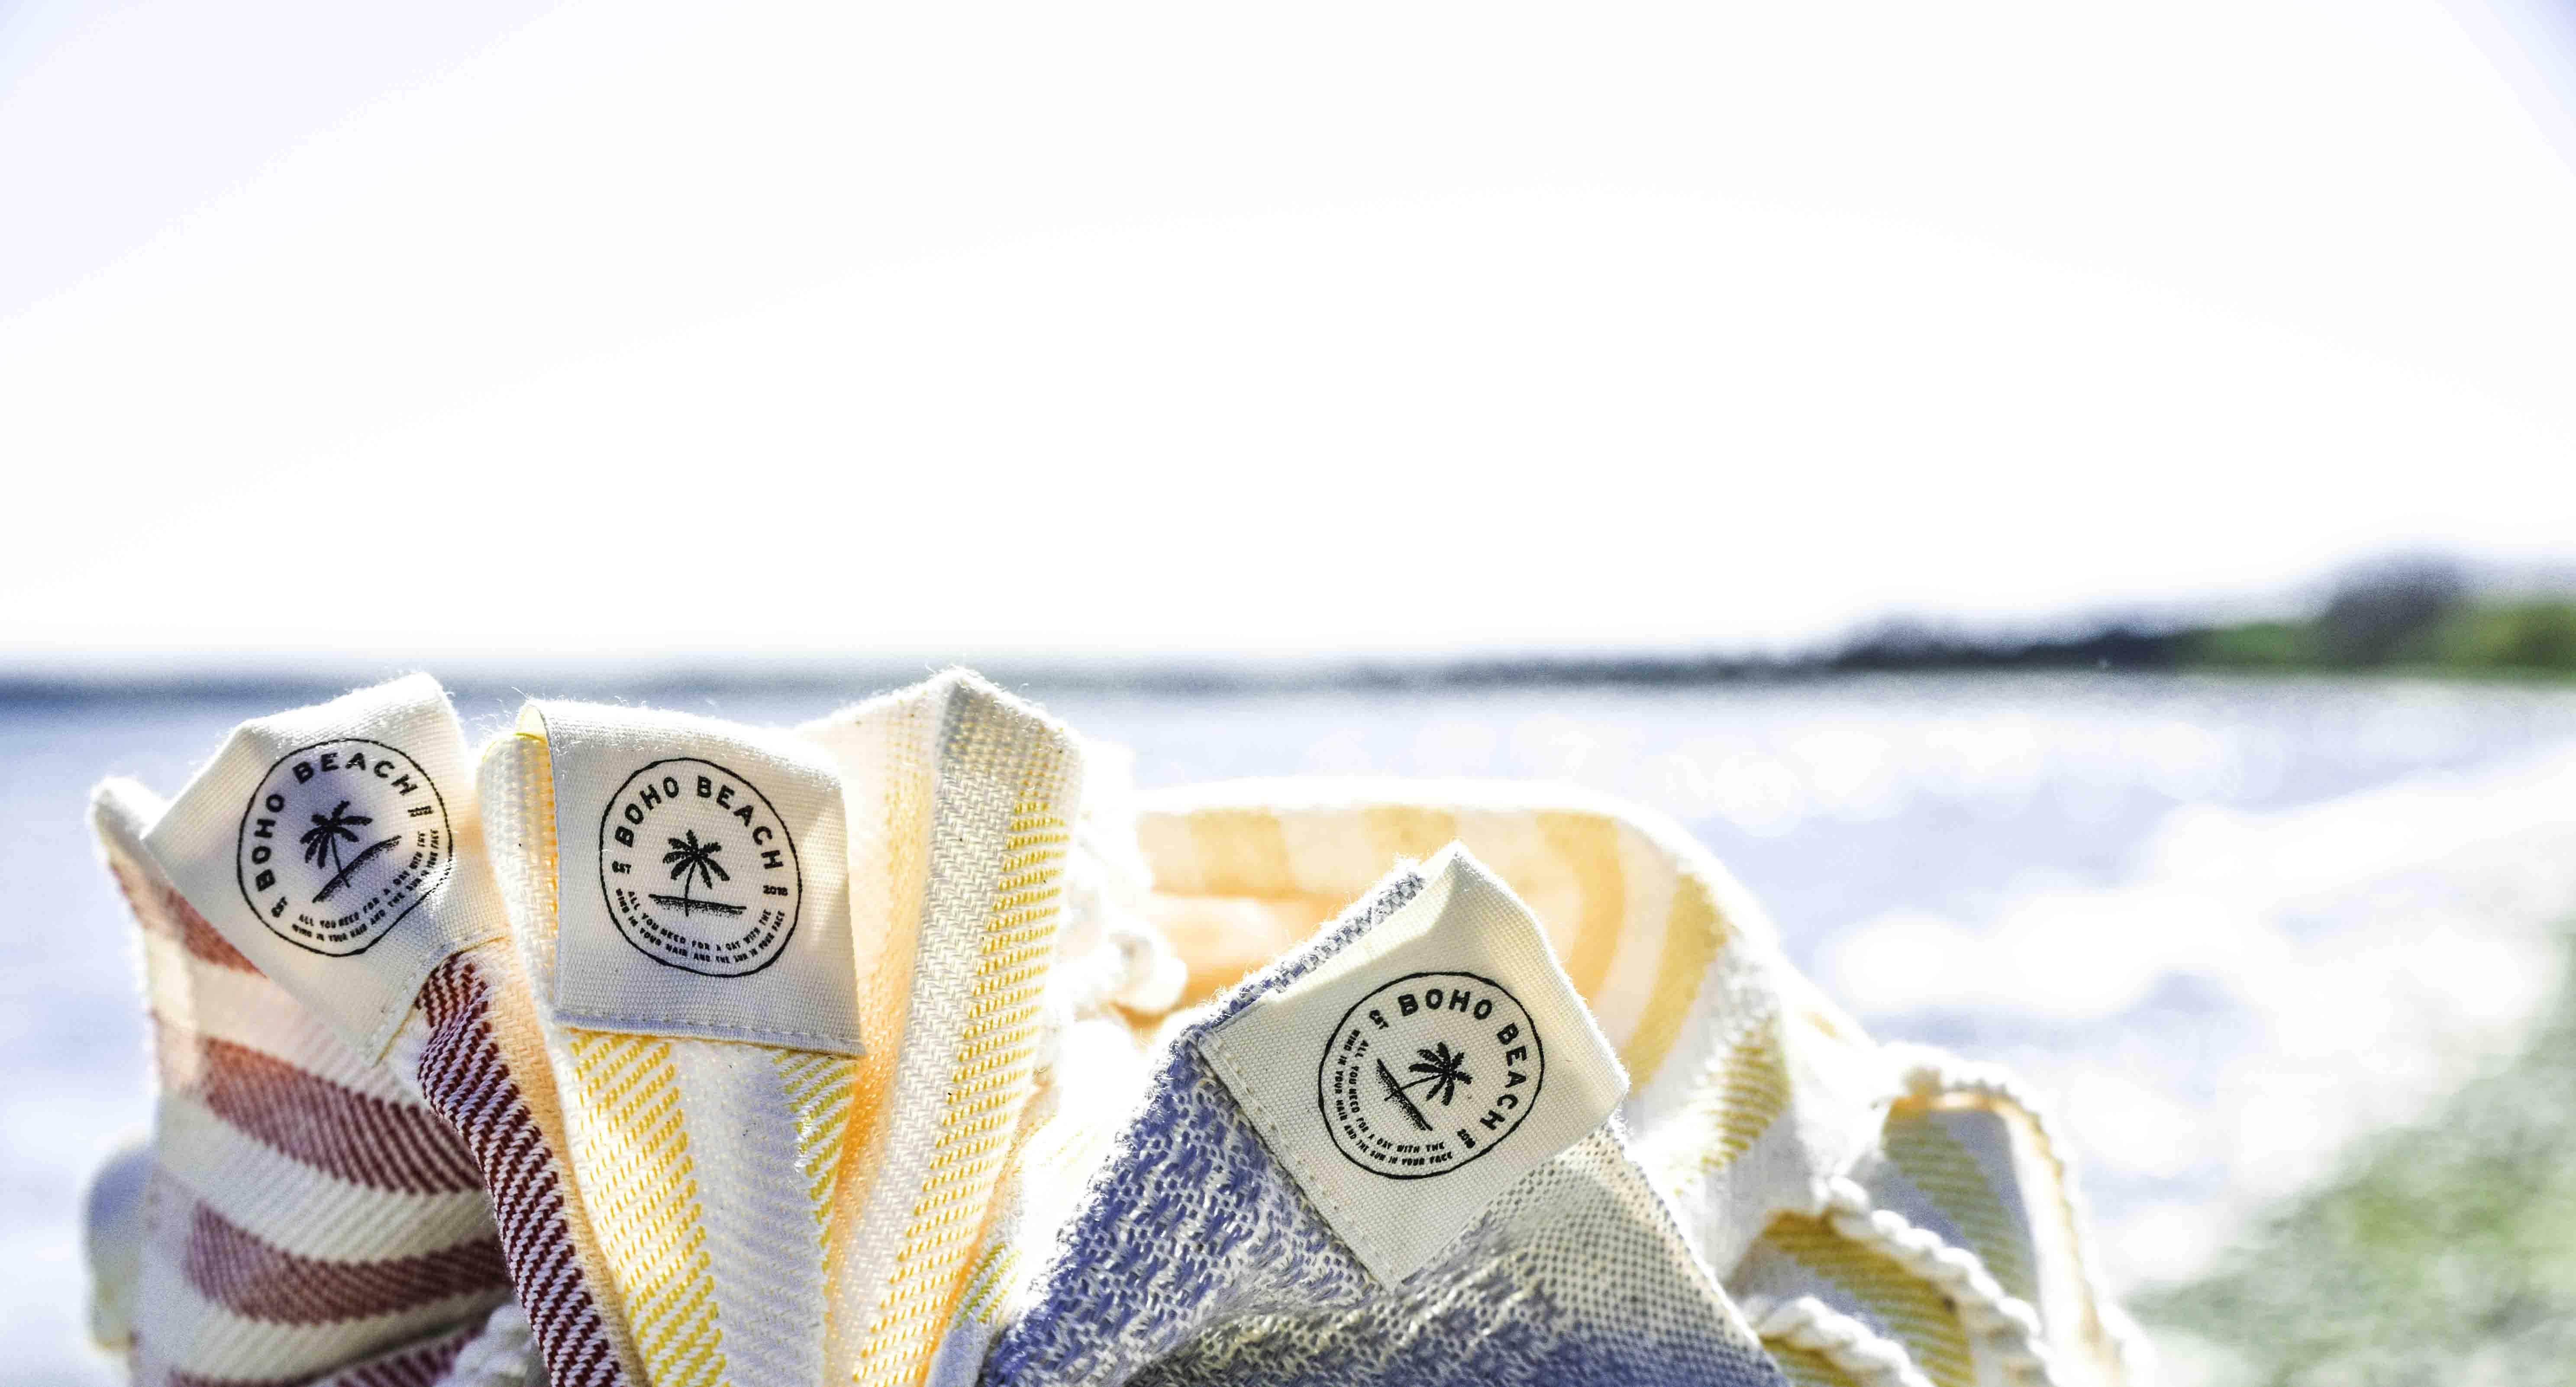 Hammam strandhåndklæder fra BohoBeach.shop